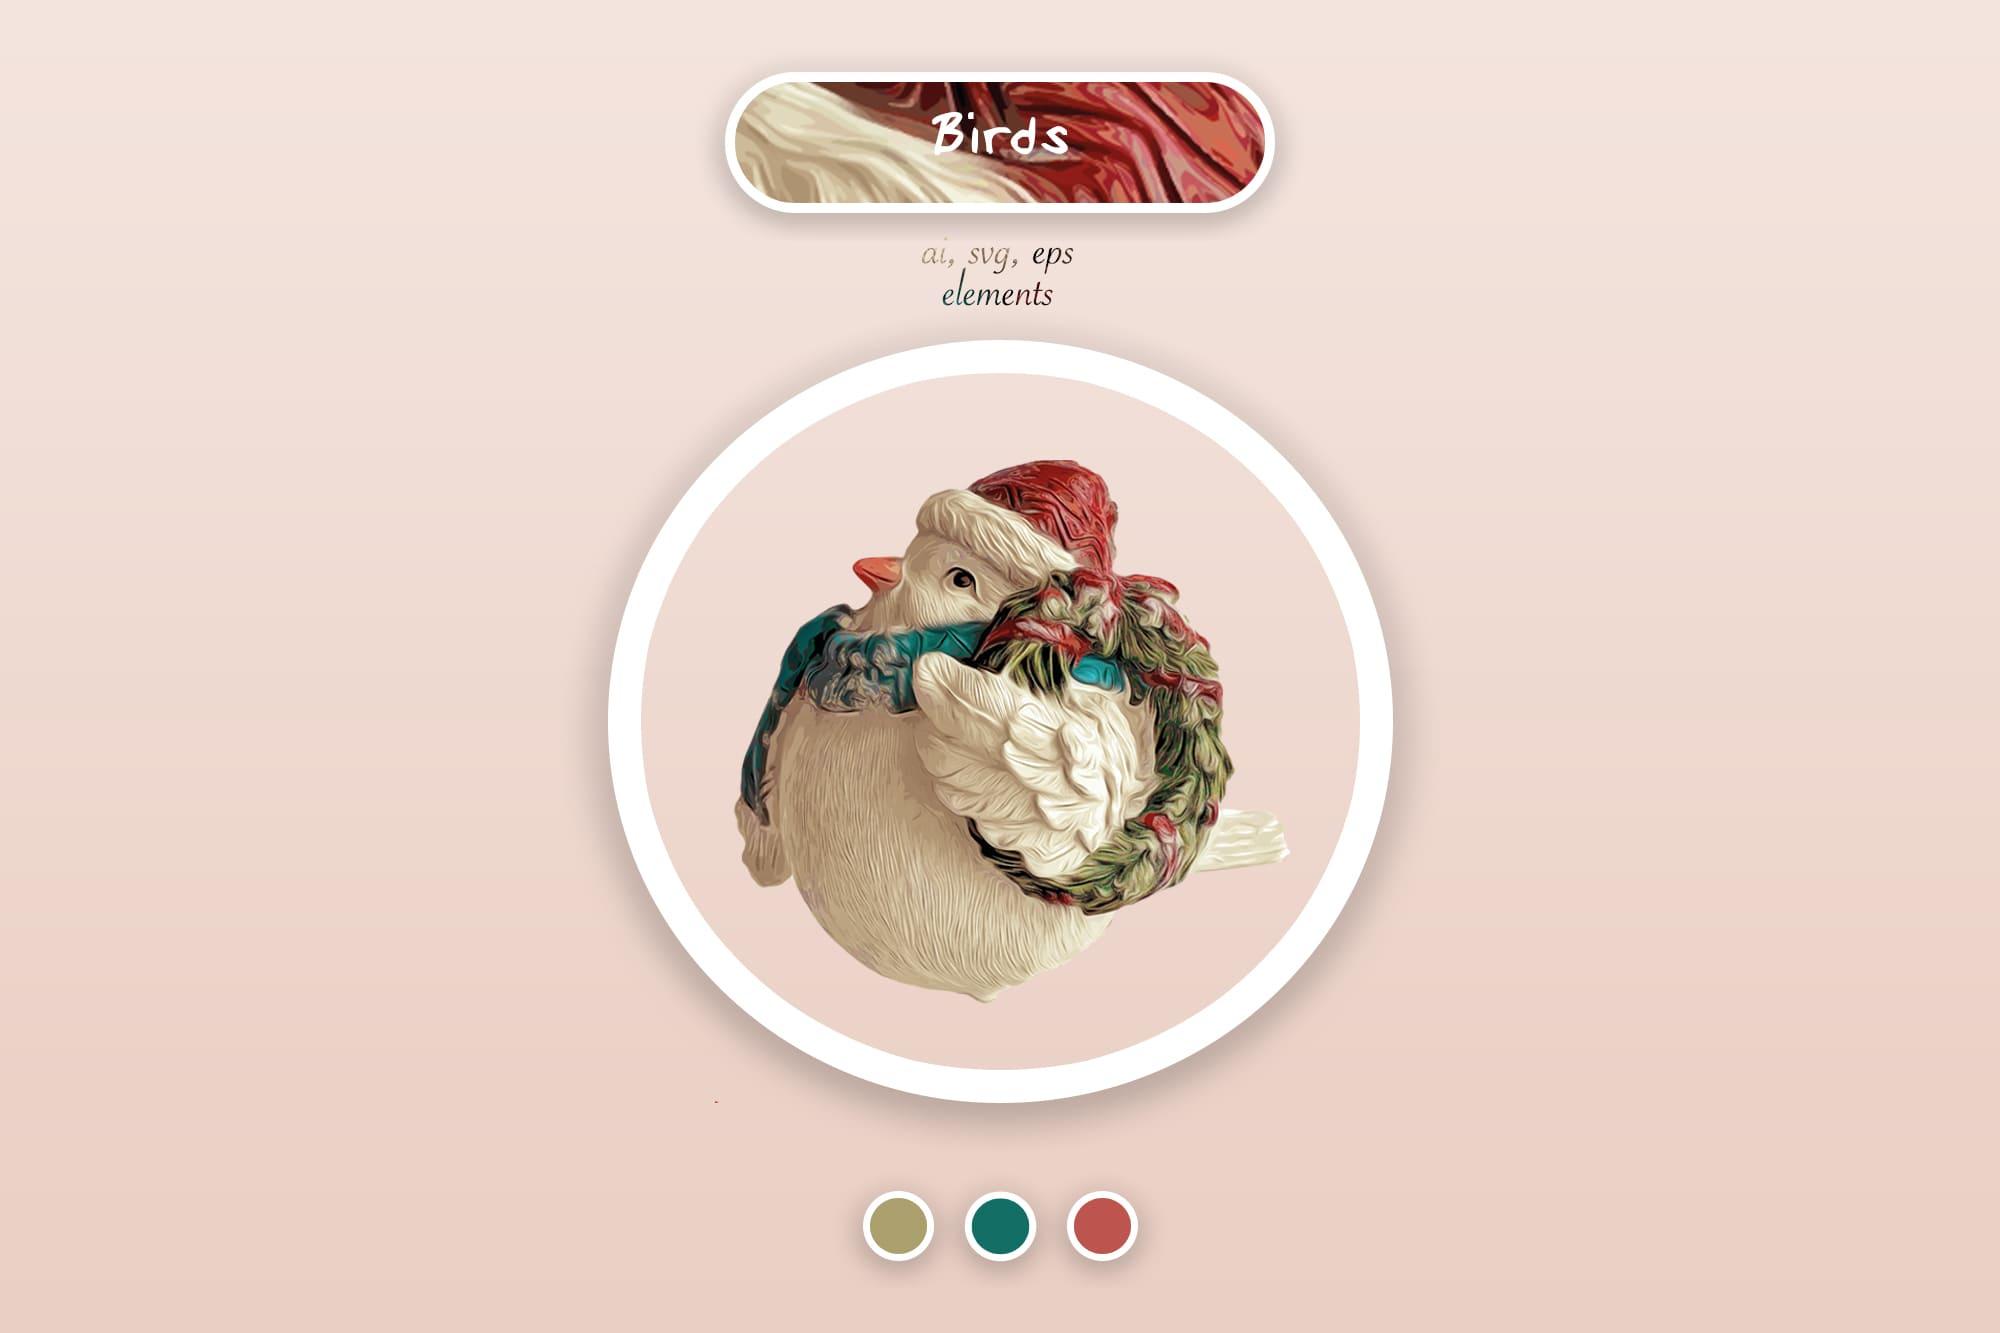 496 Christmas Illustrations: Christmas Vectors Bundle SVG, EPS, AI - Birds 4a